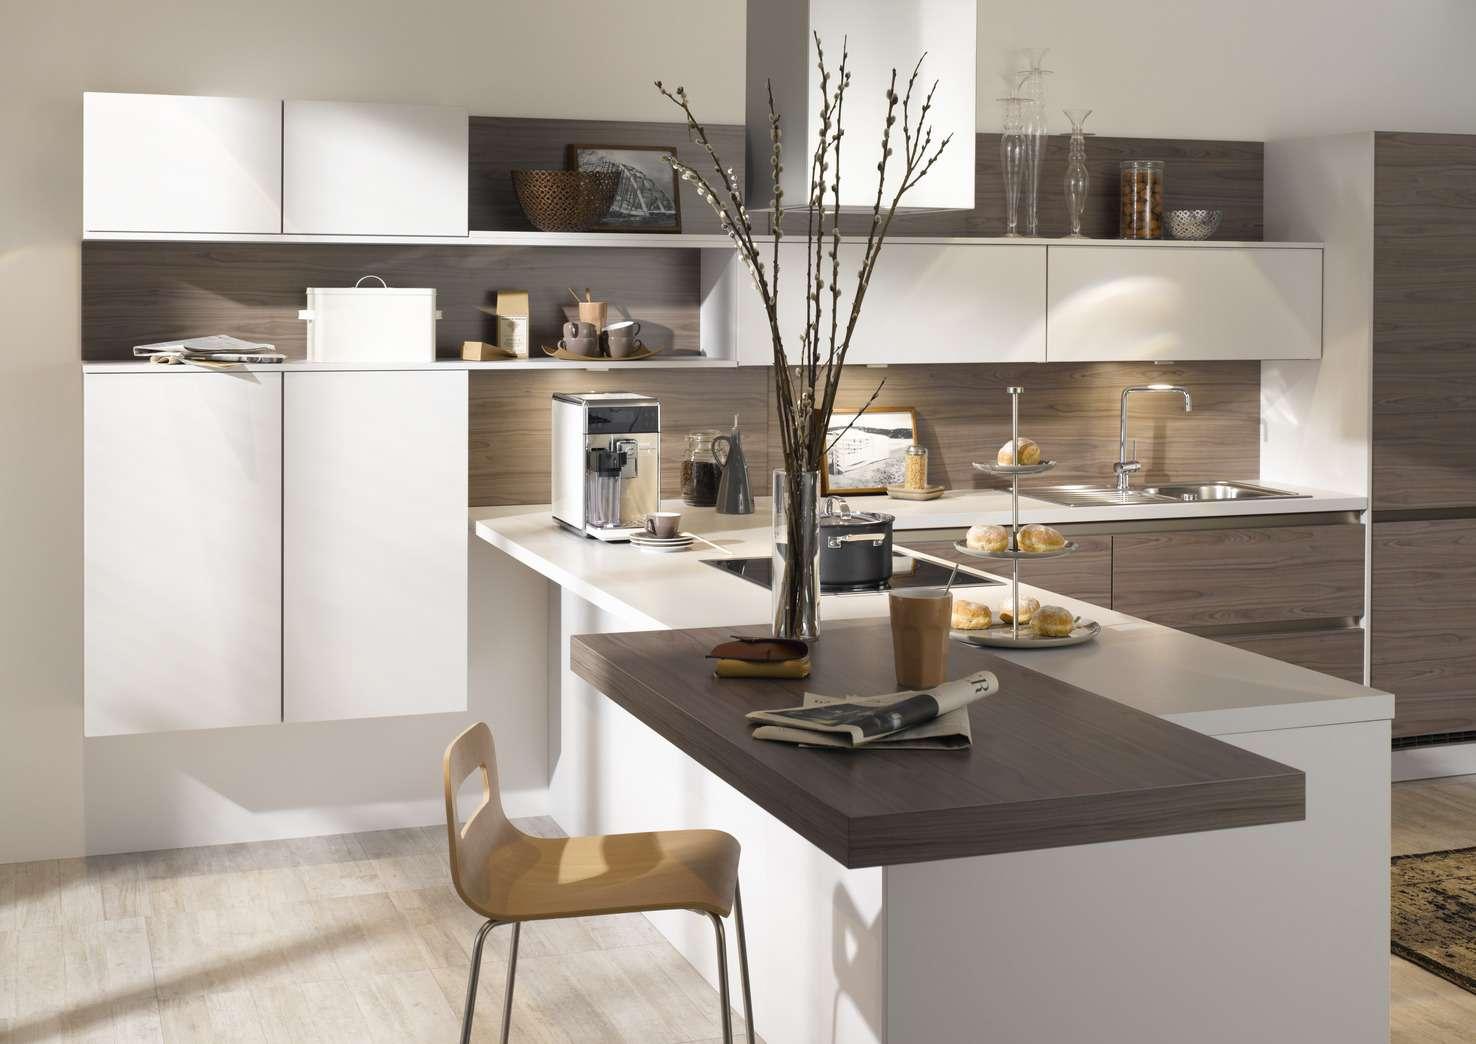 k chen mit sitzgelegenheit. Black Bedroom Furniture Sets. Home Design Ideas